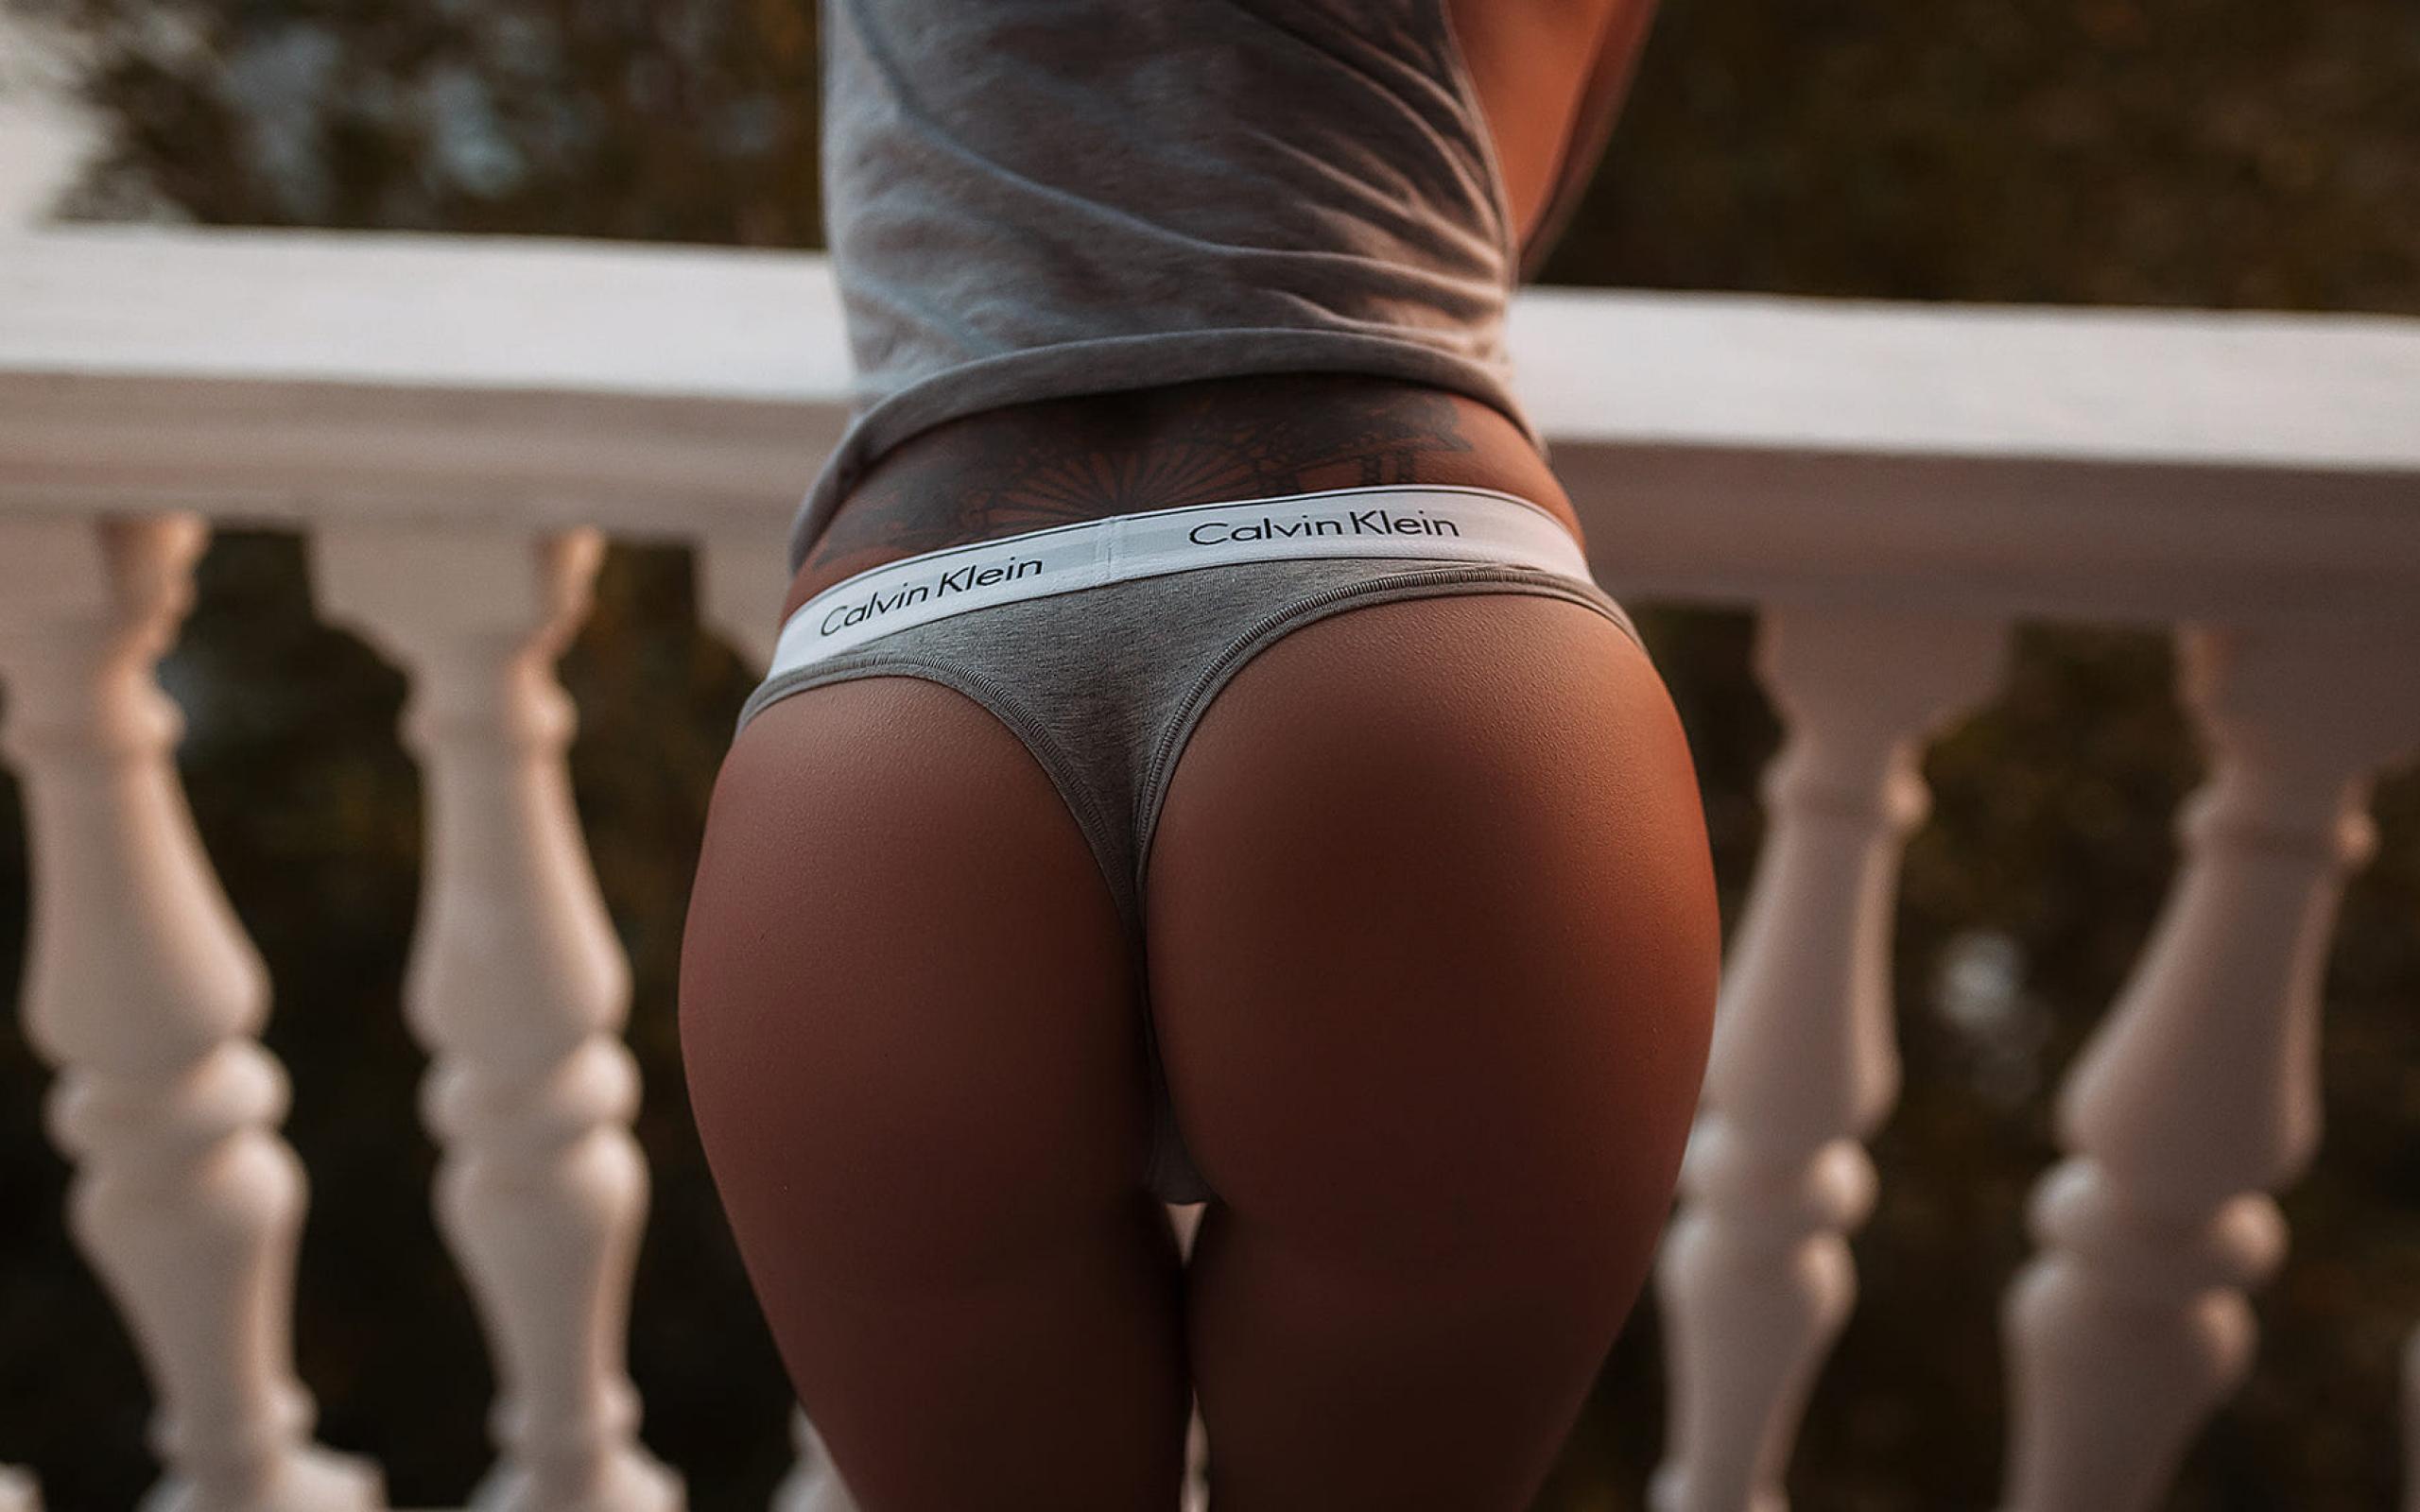 Download photo 1600x1200, malena morgan, beautiful, sexy